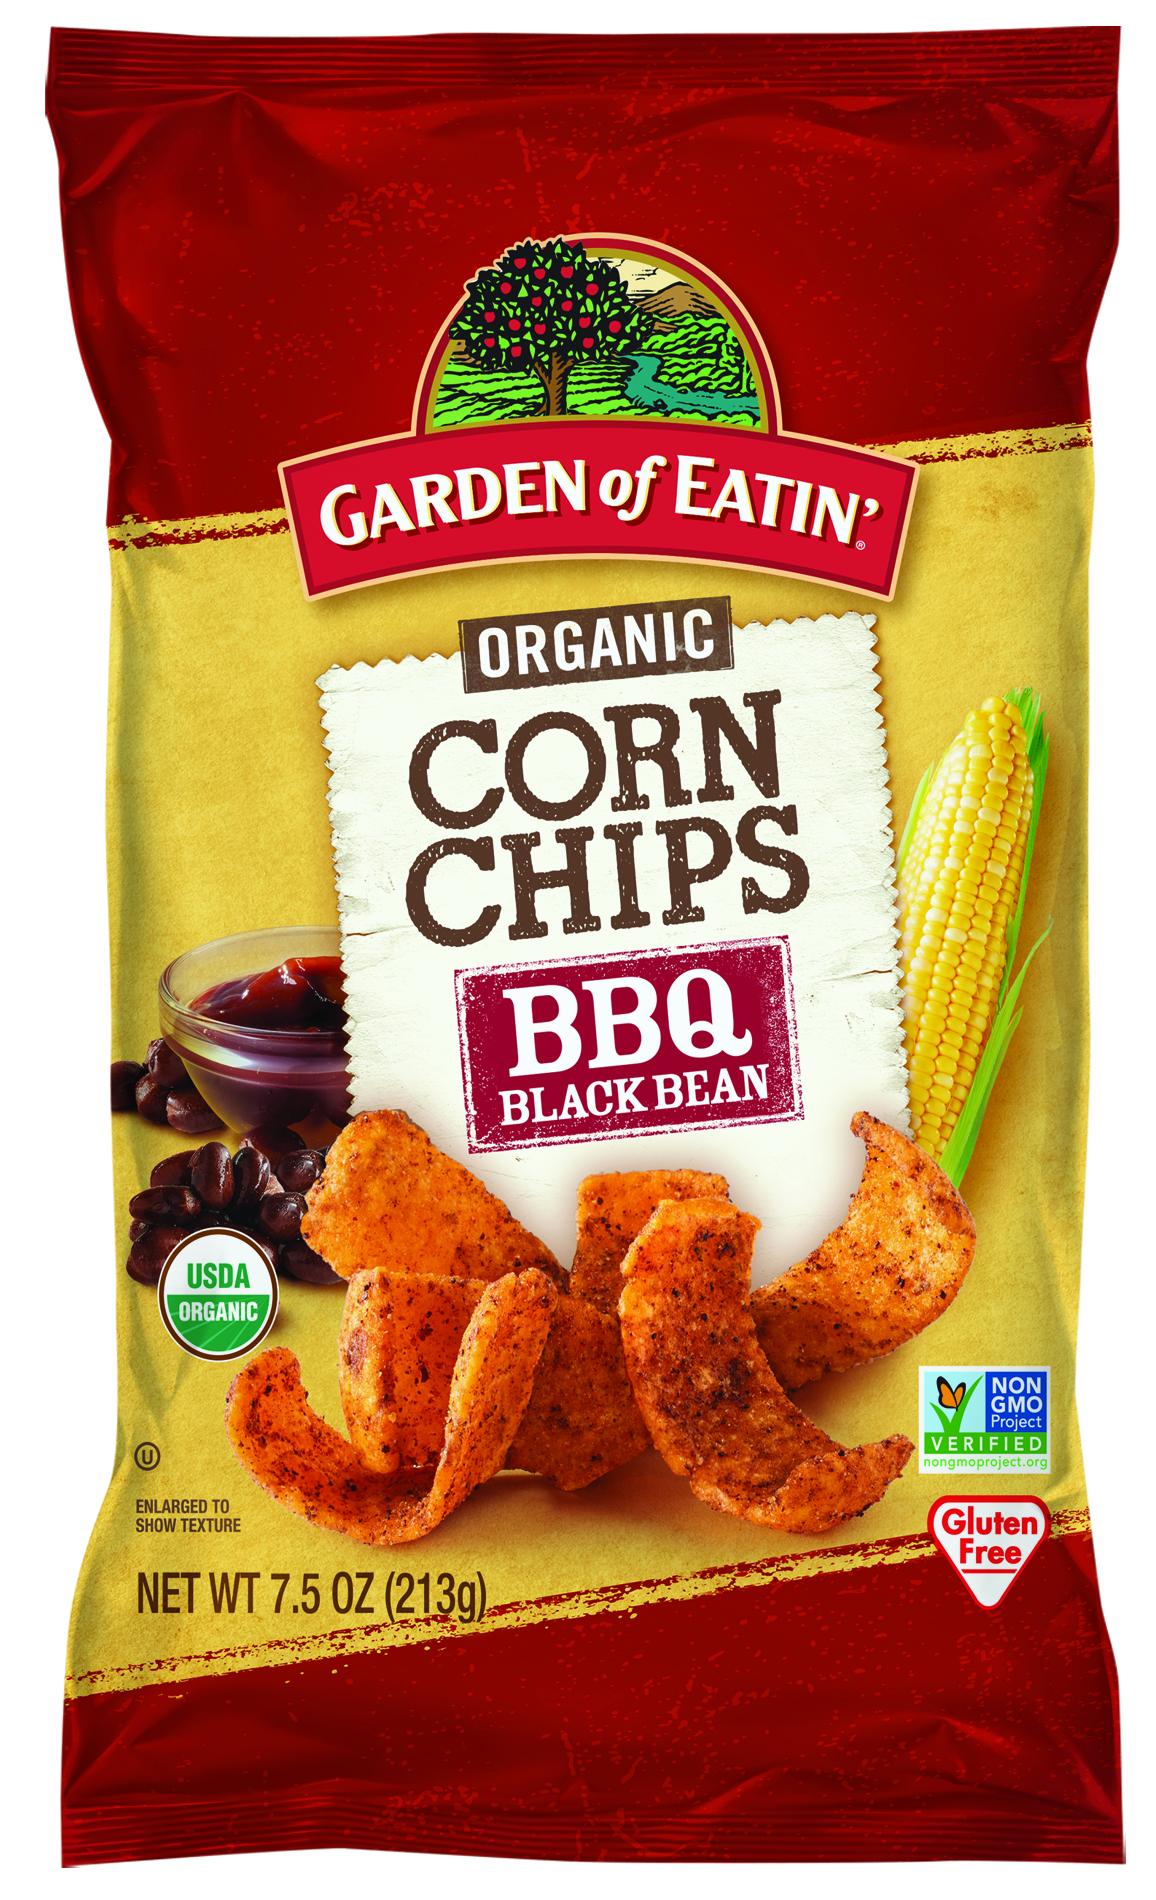 Garden of Eatin': Organic Corn Chips